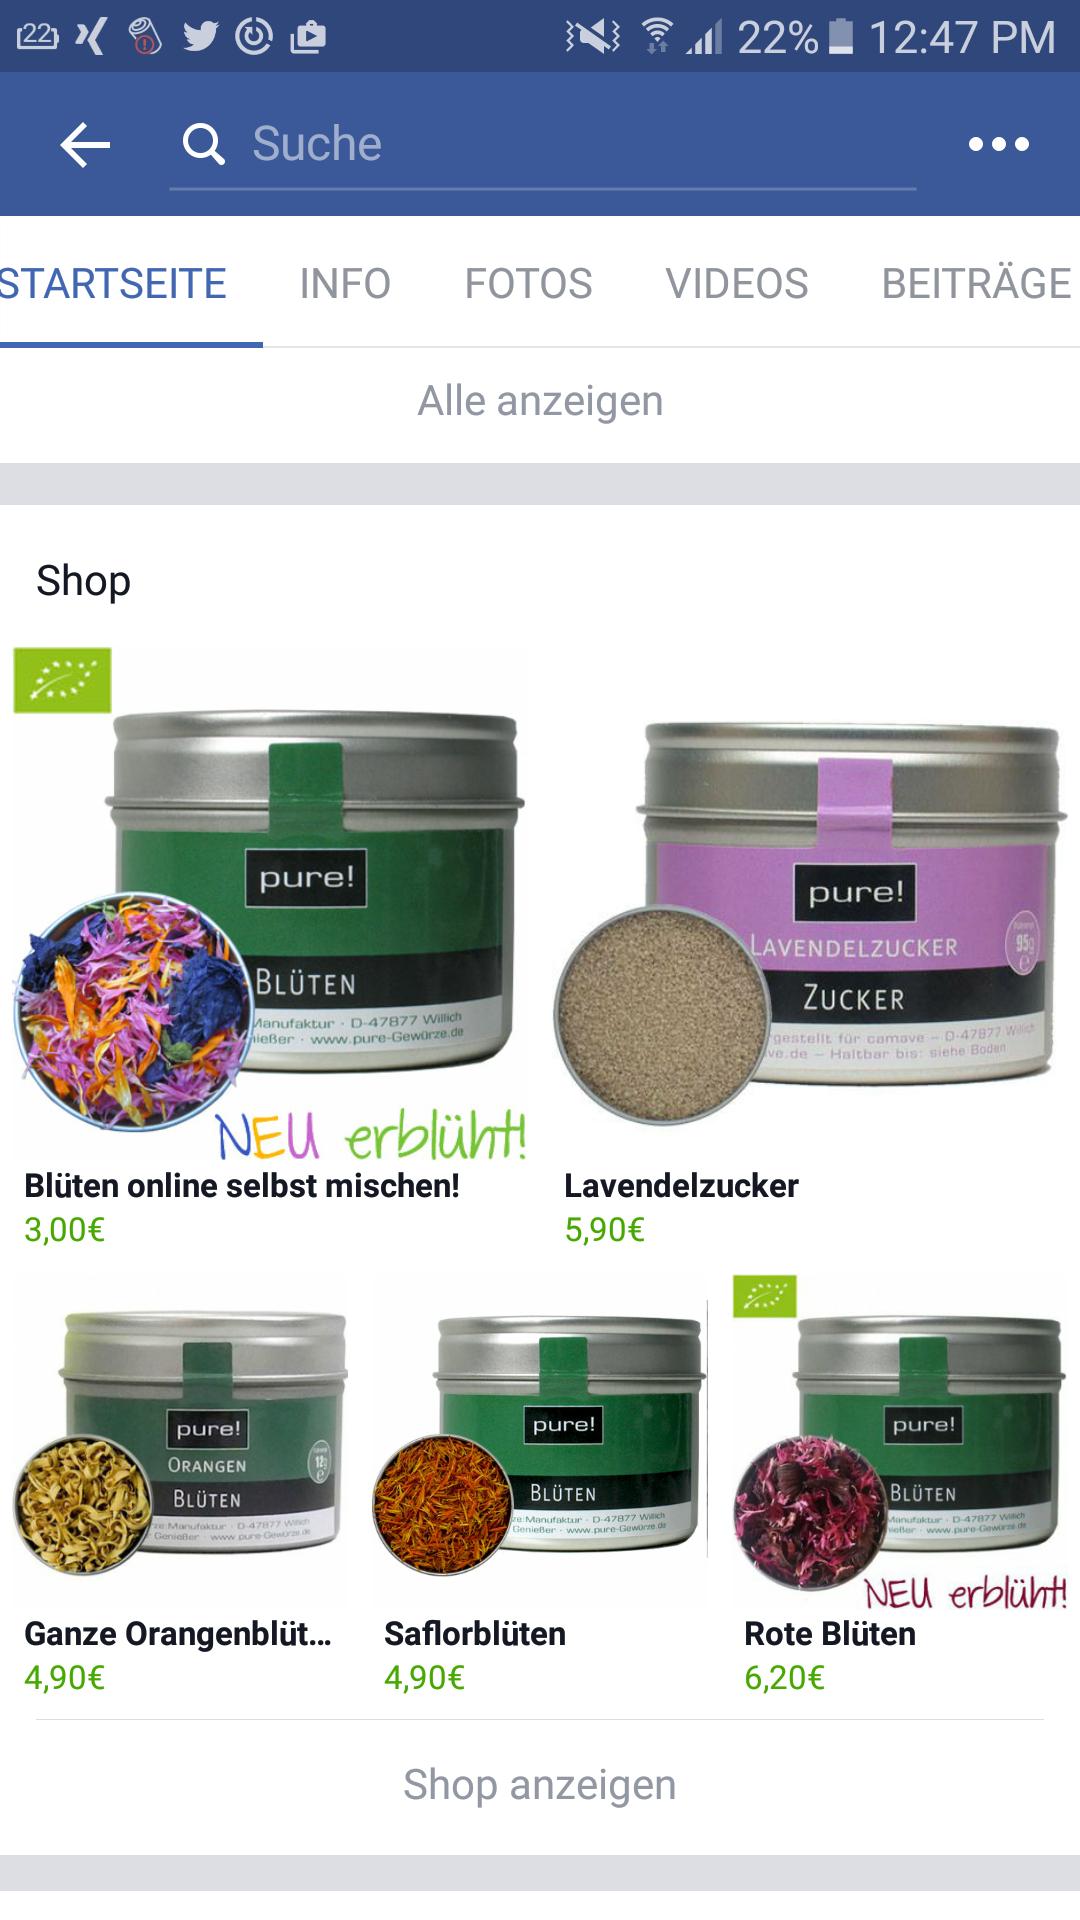 Mobile Übersicht Facebook Shop